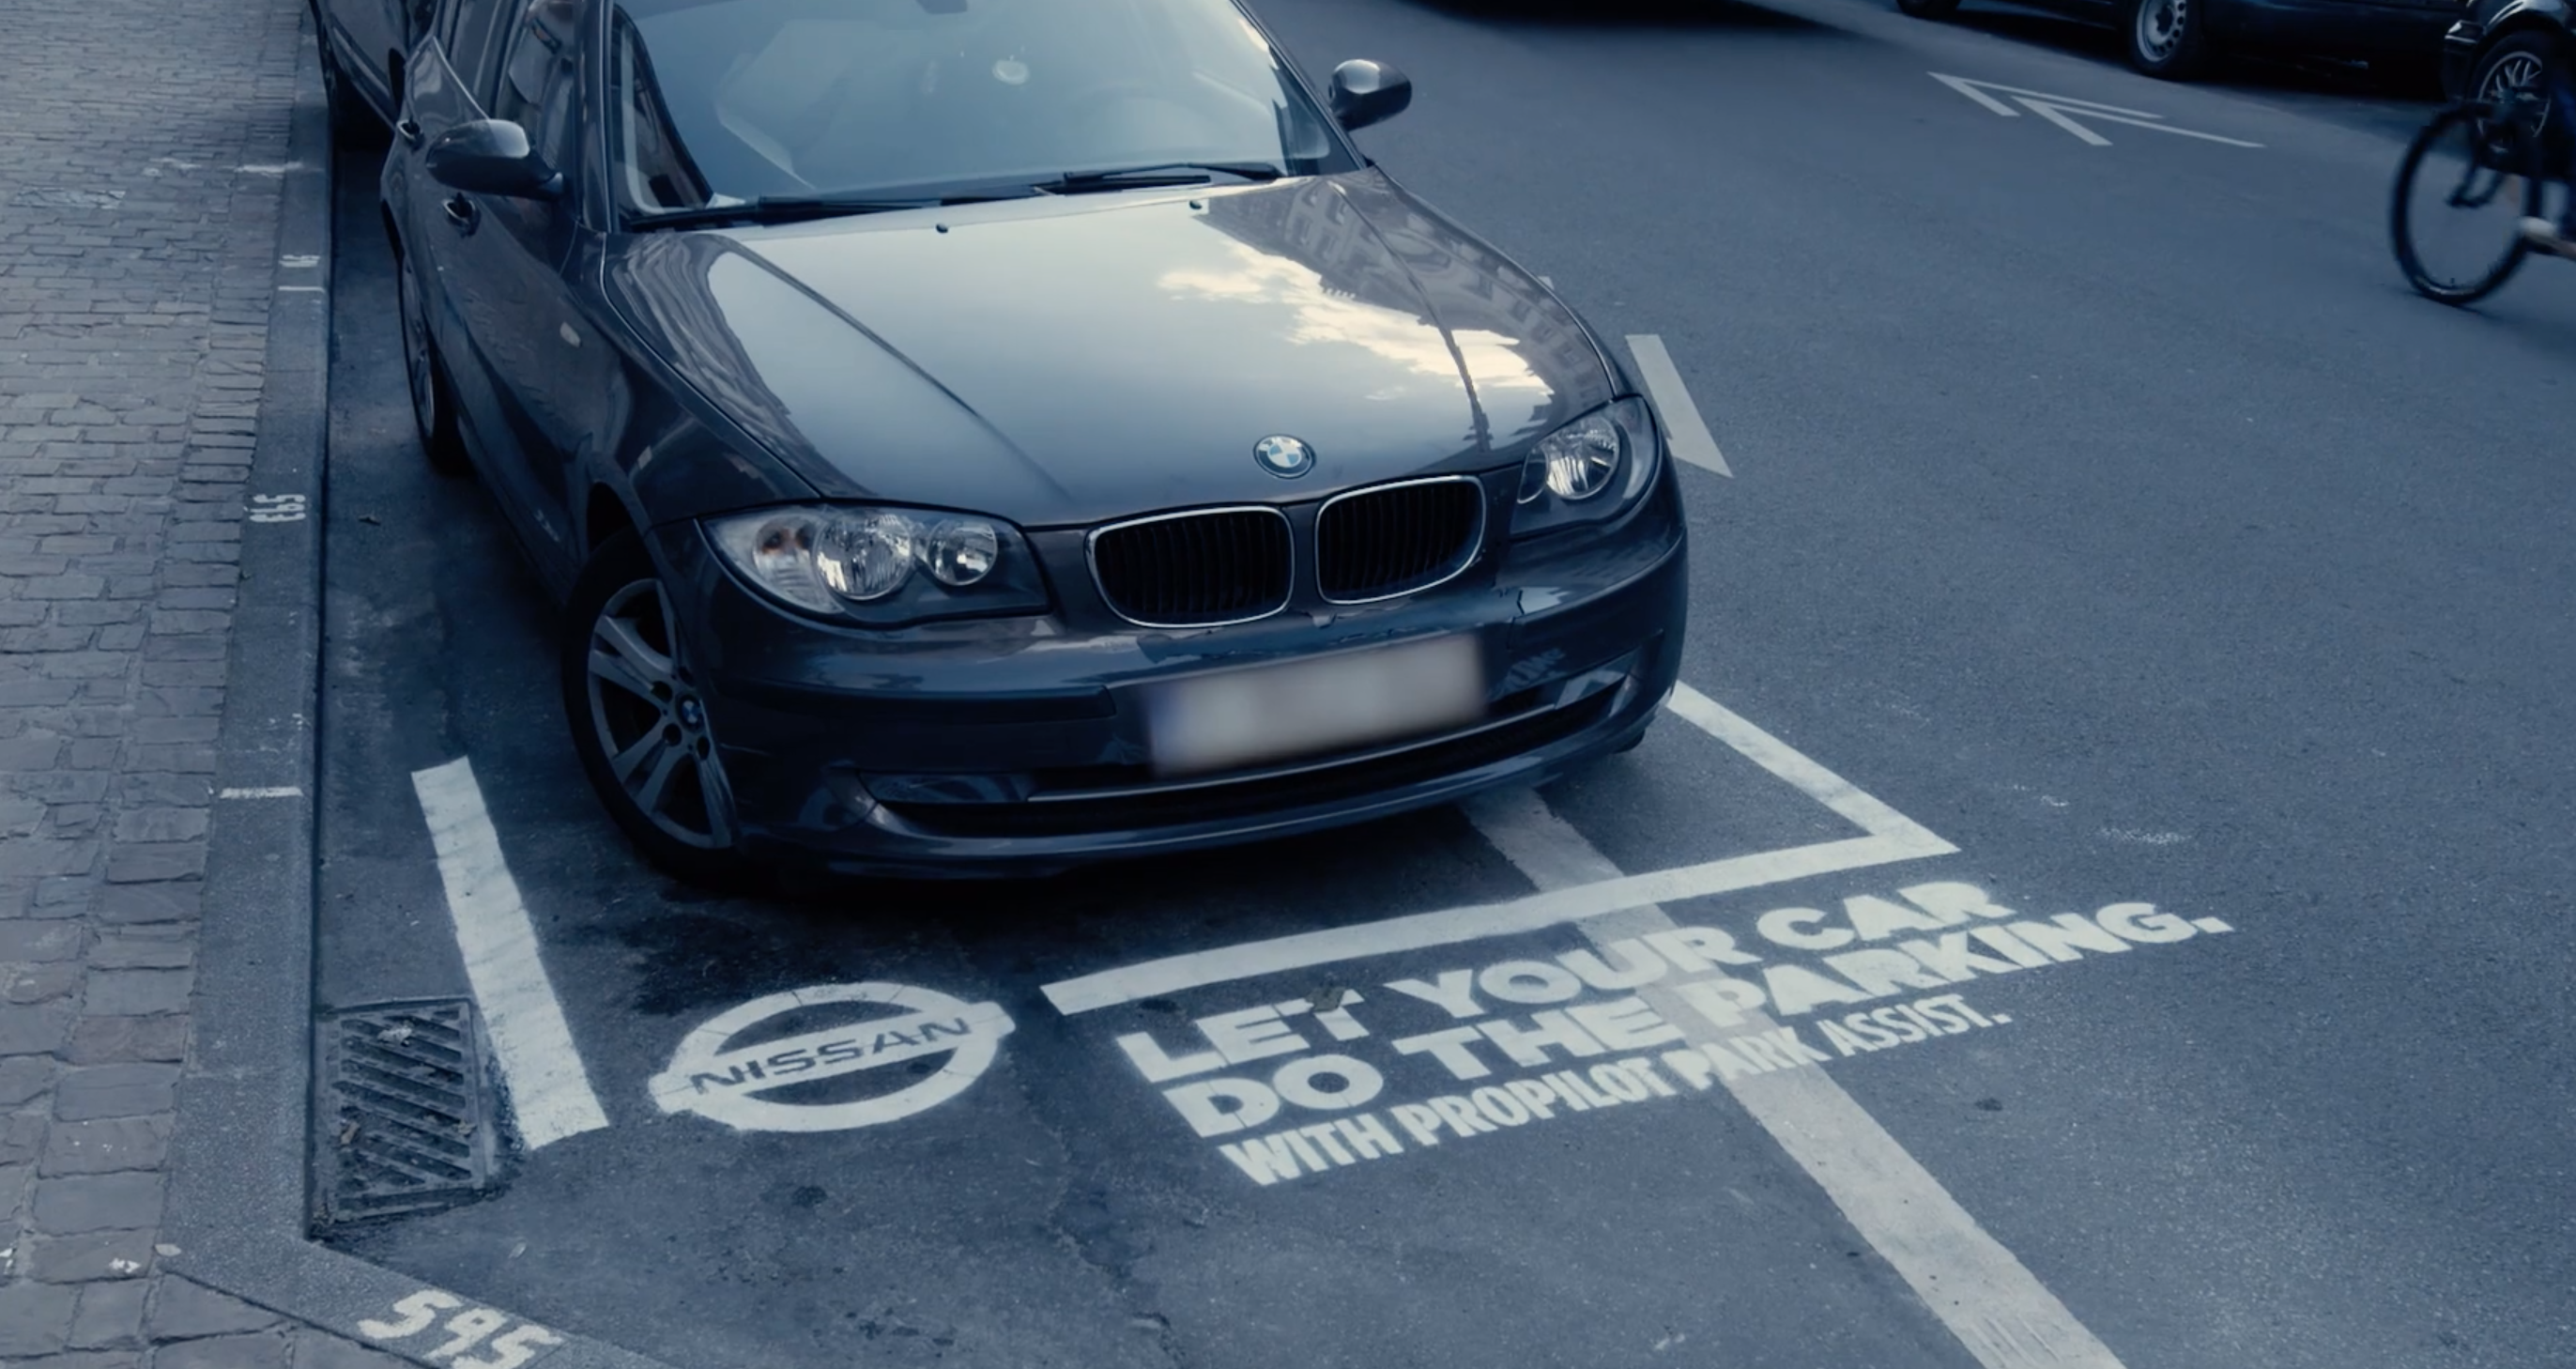 Nissan Benelux – Dumb parking ads